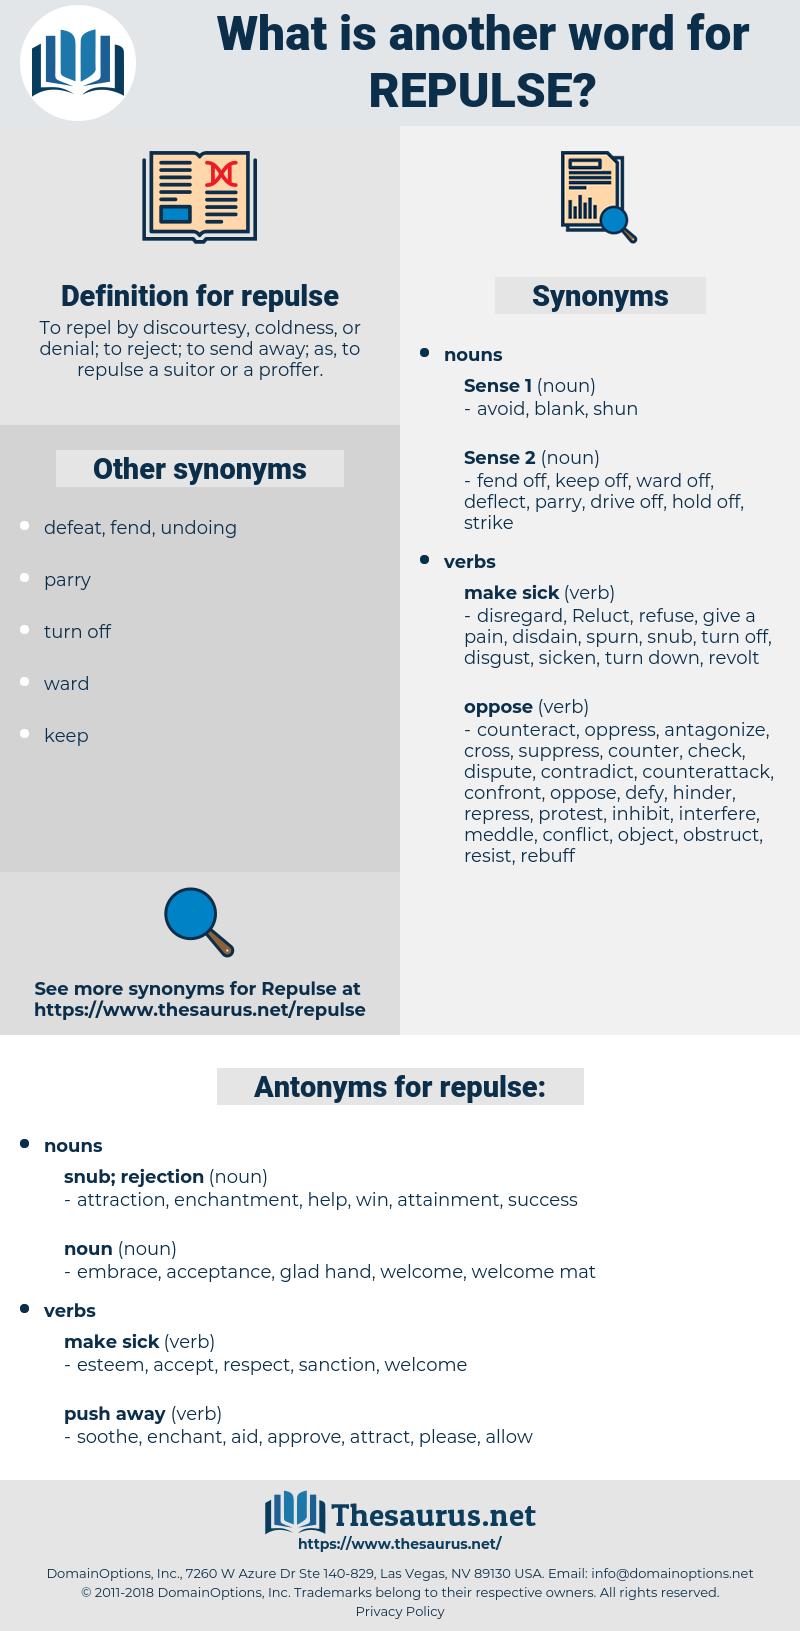 repulse, synonym repulse, another word for repulse, words like repulse, thesaurus repulse